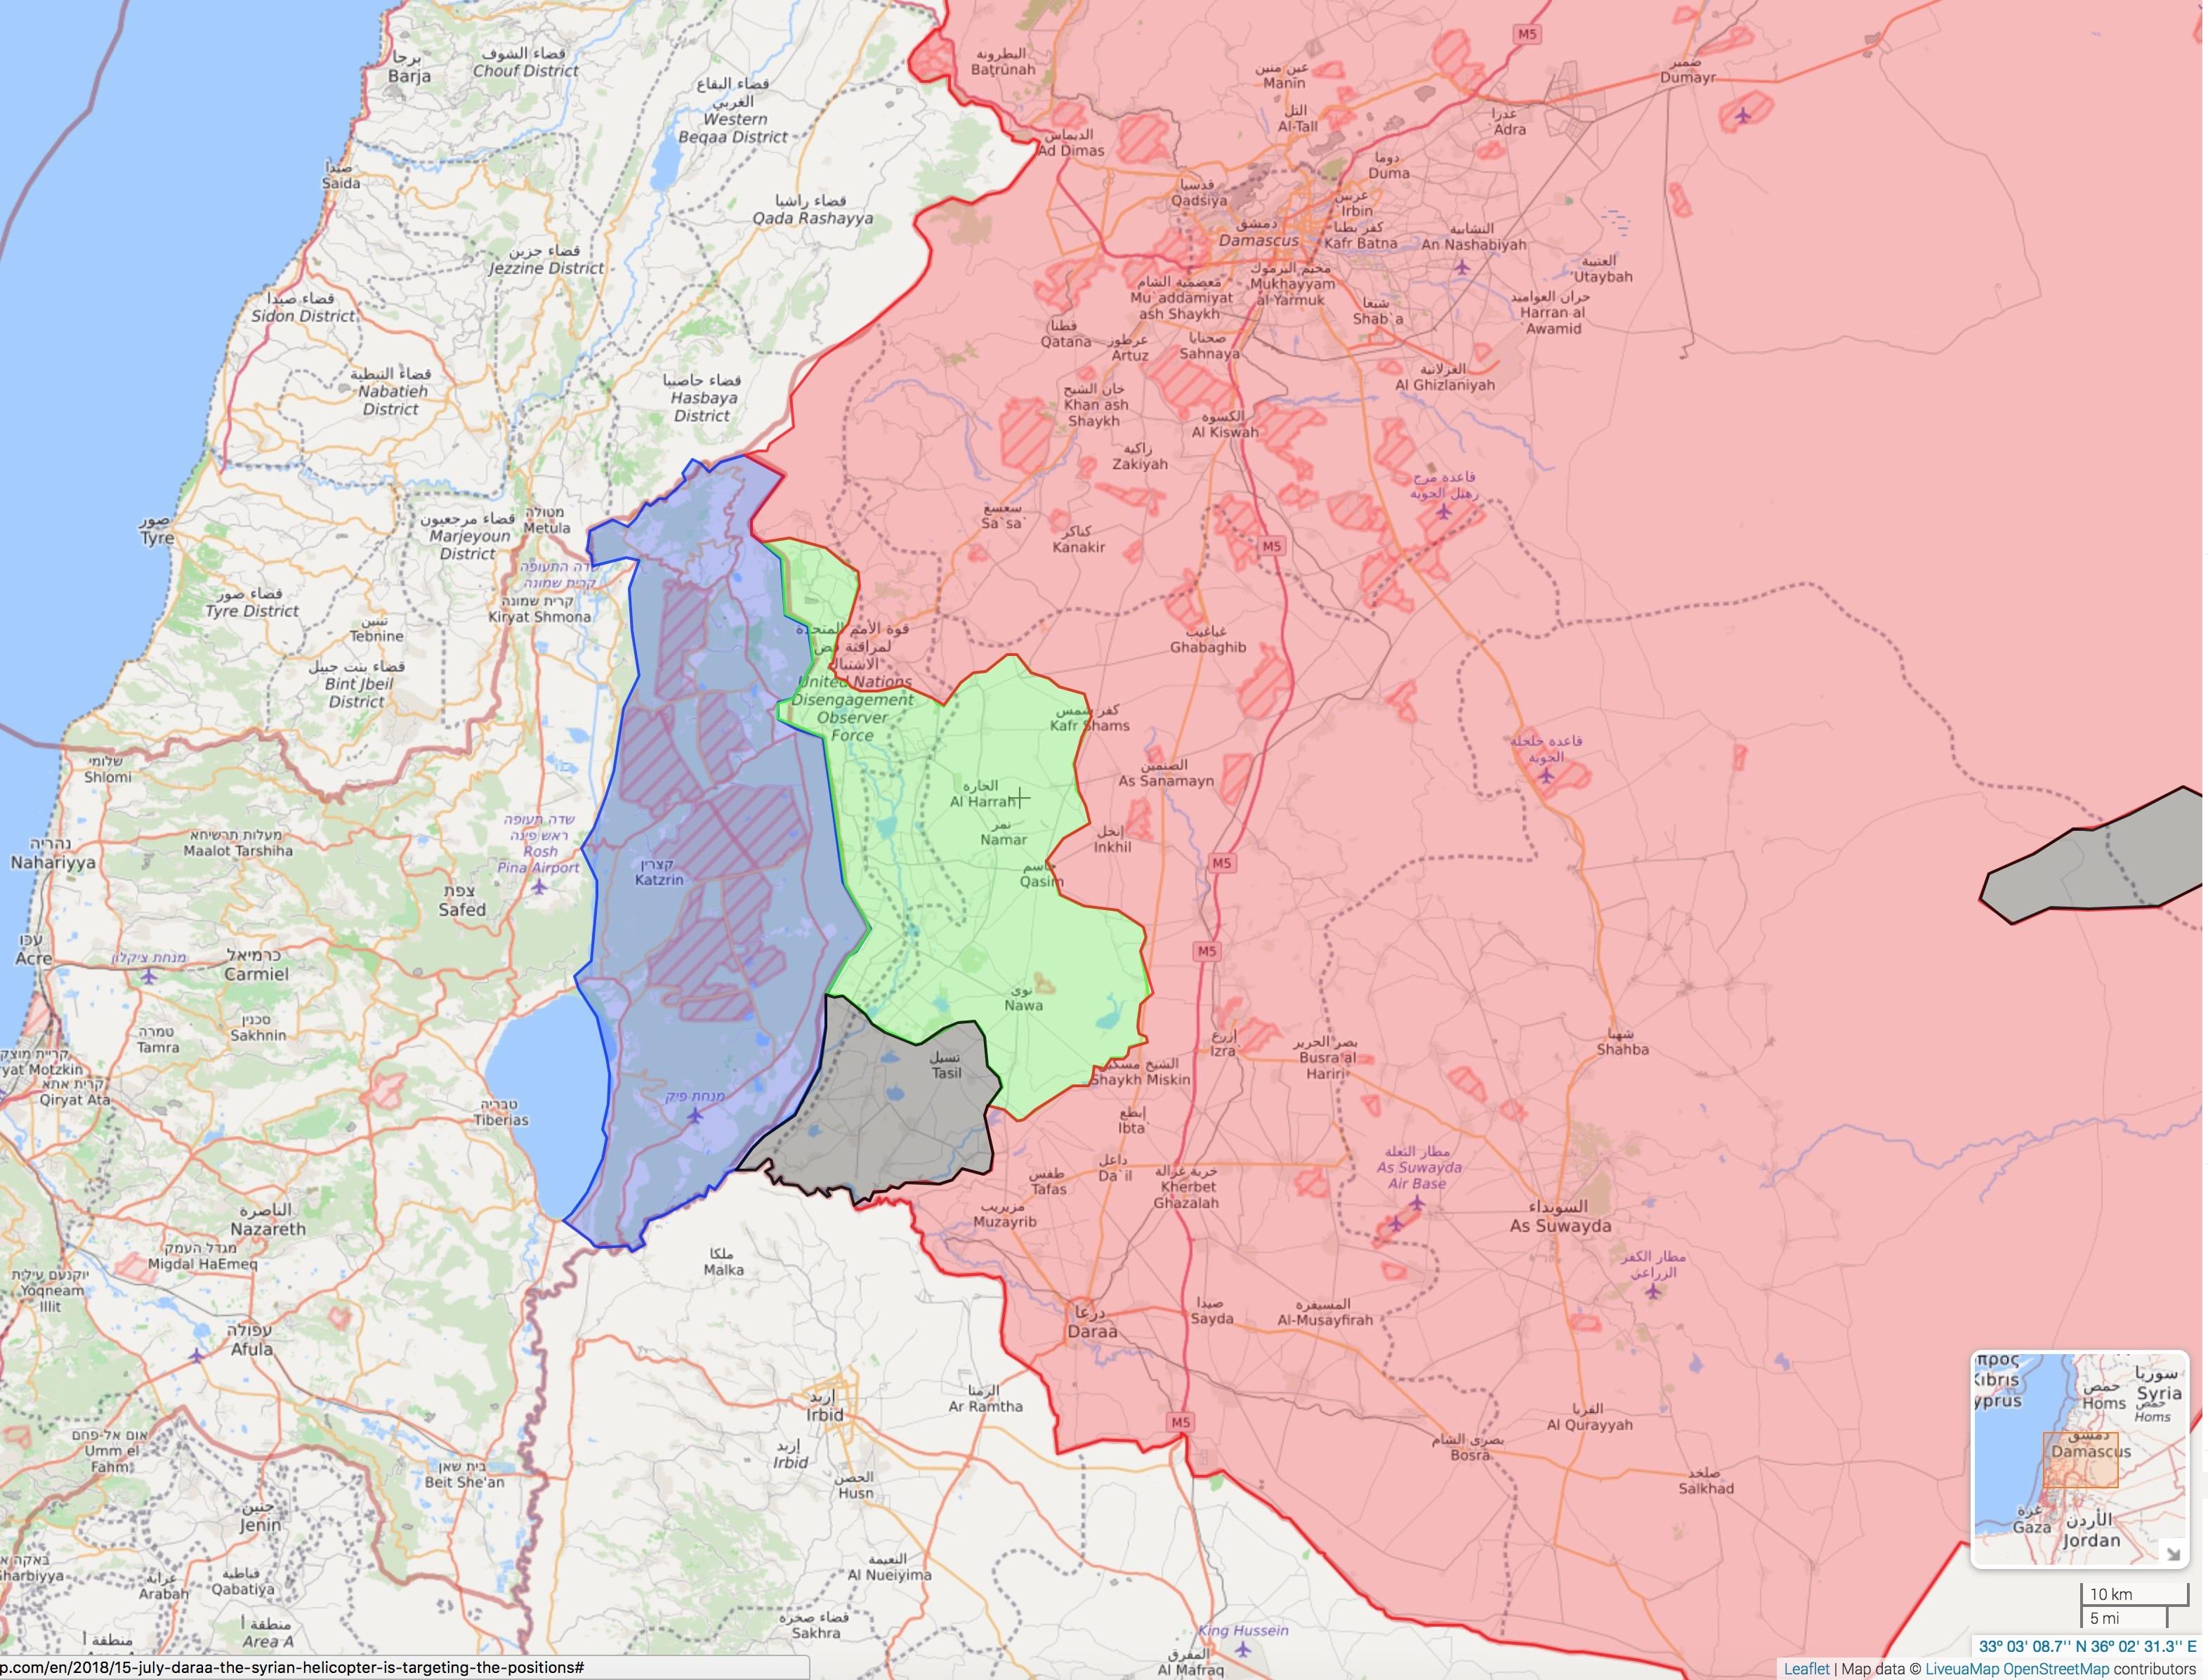 Image map [Daraa, Syria, via https://syria.liveuamap.com/]